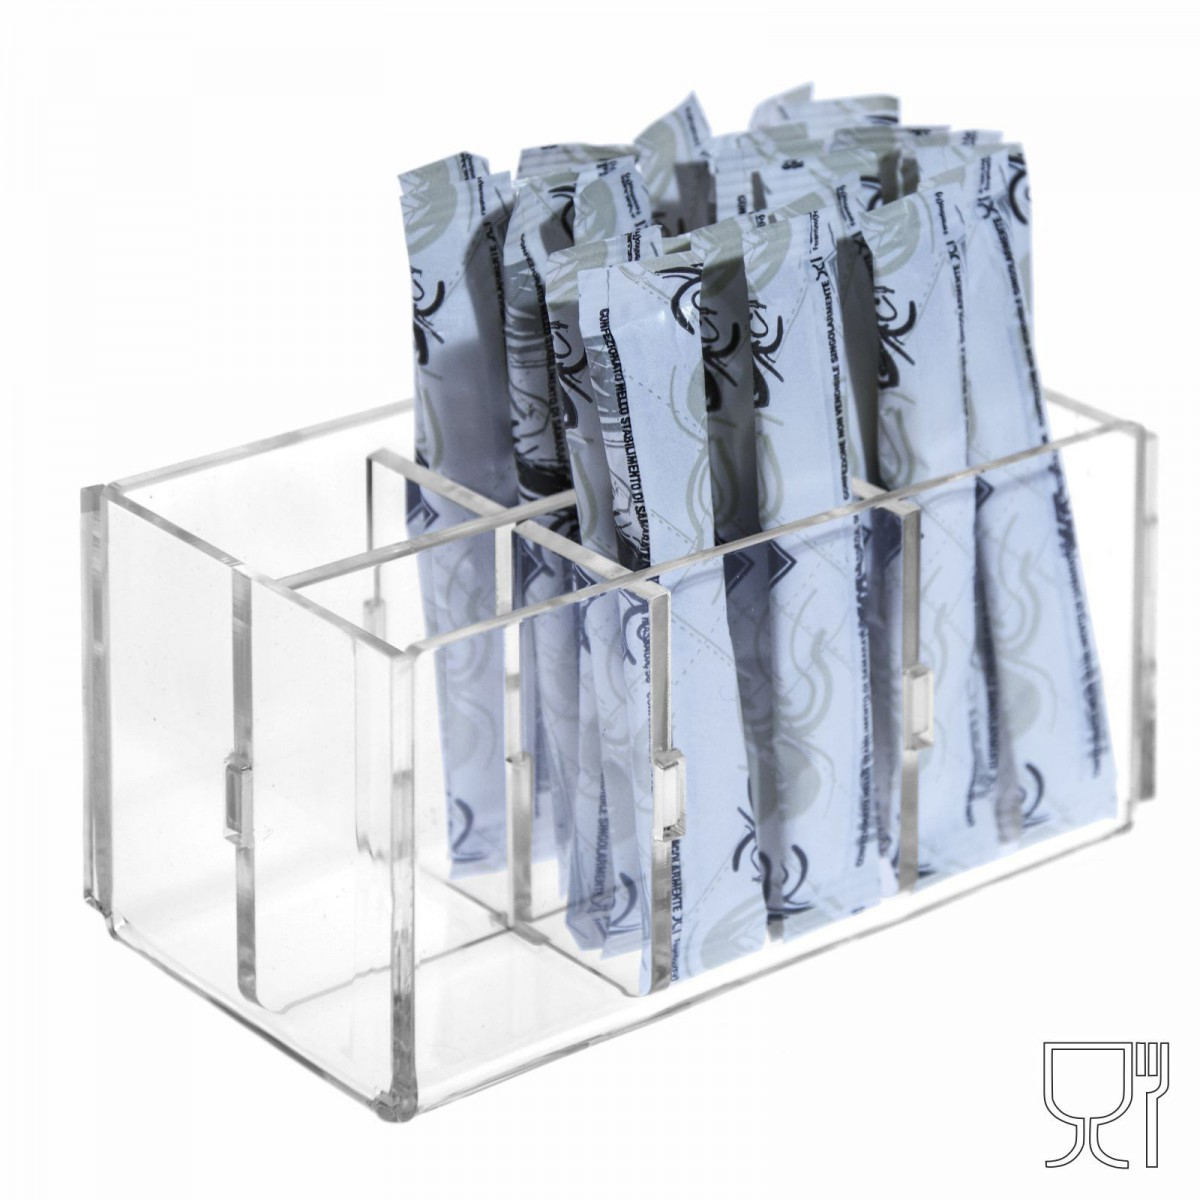 E-228 POB-G - Porta bustine zucchero stick in Plexiglass capacità 6 postazioni - CM(LxPxH): 12.5x7x6